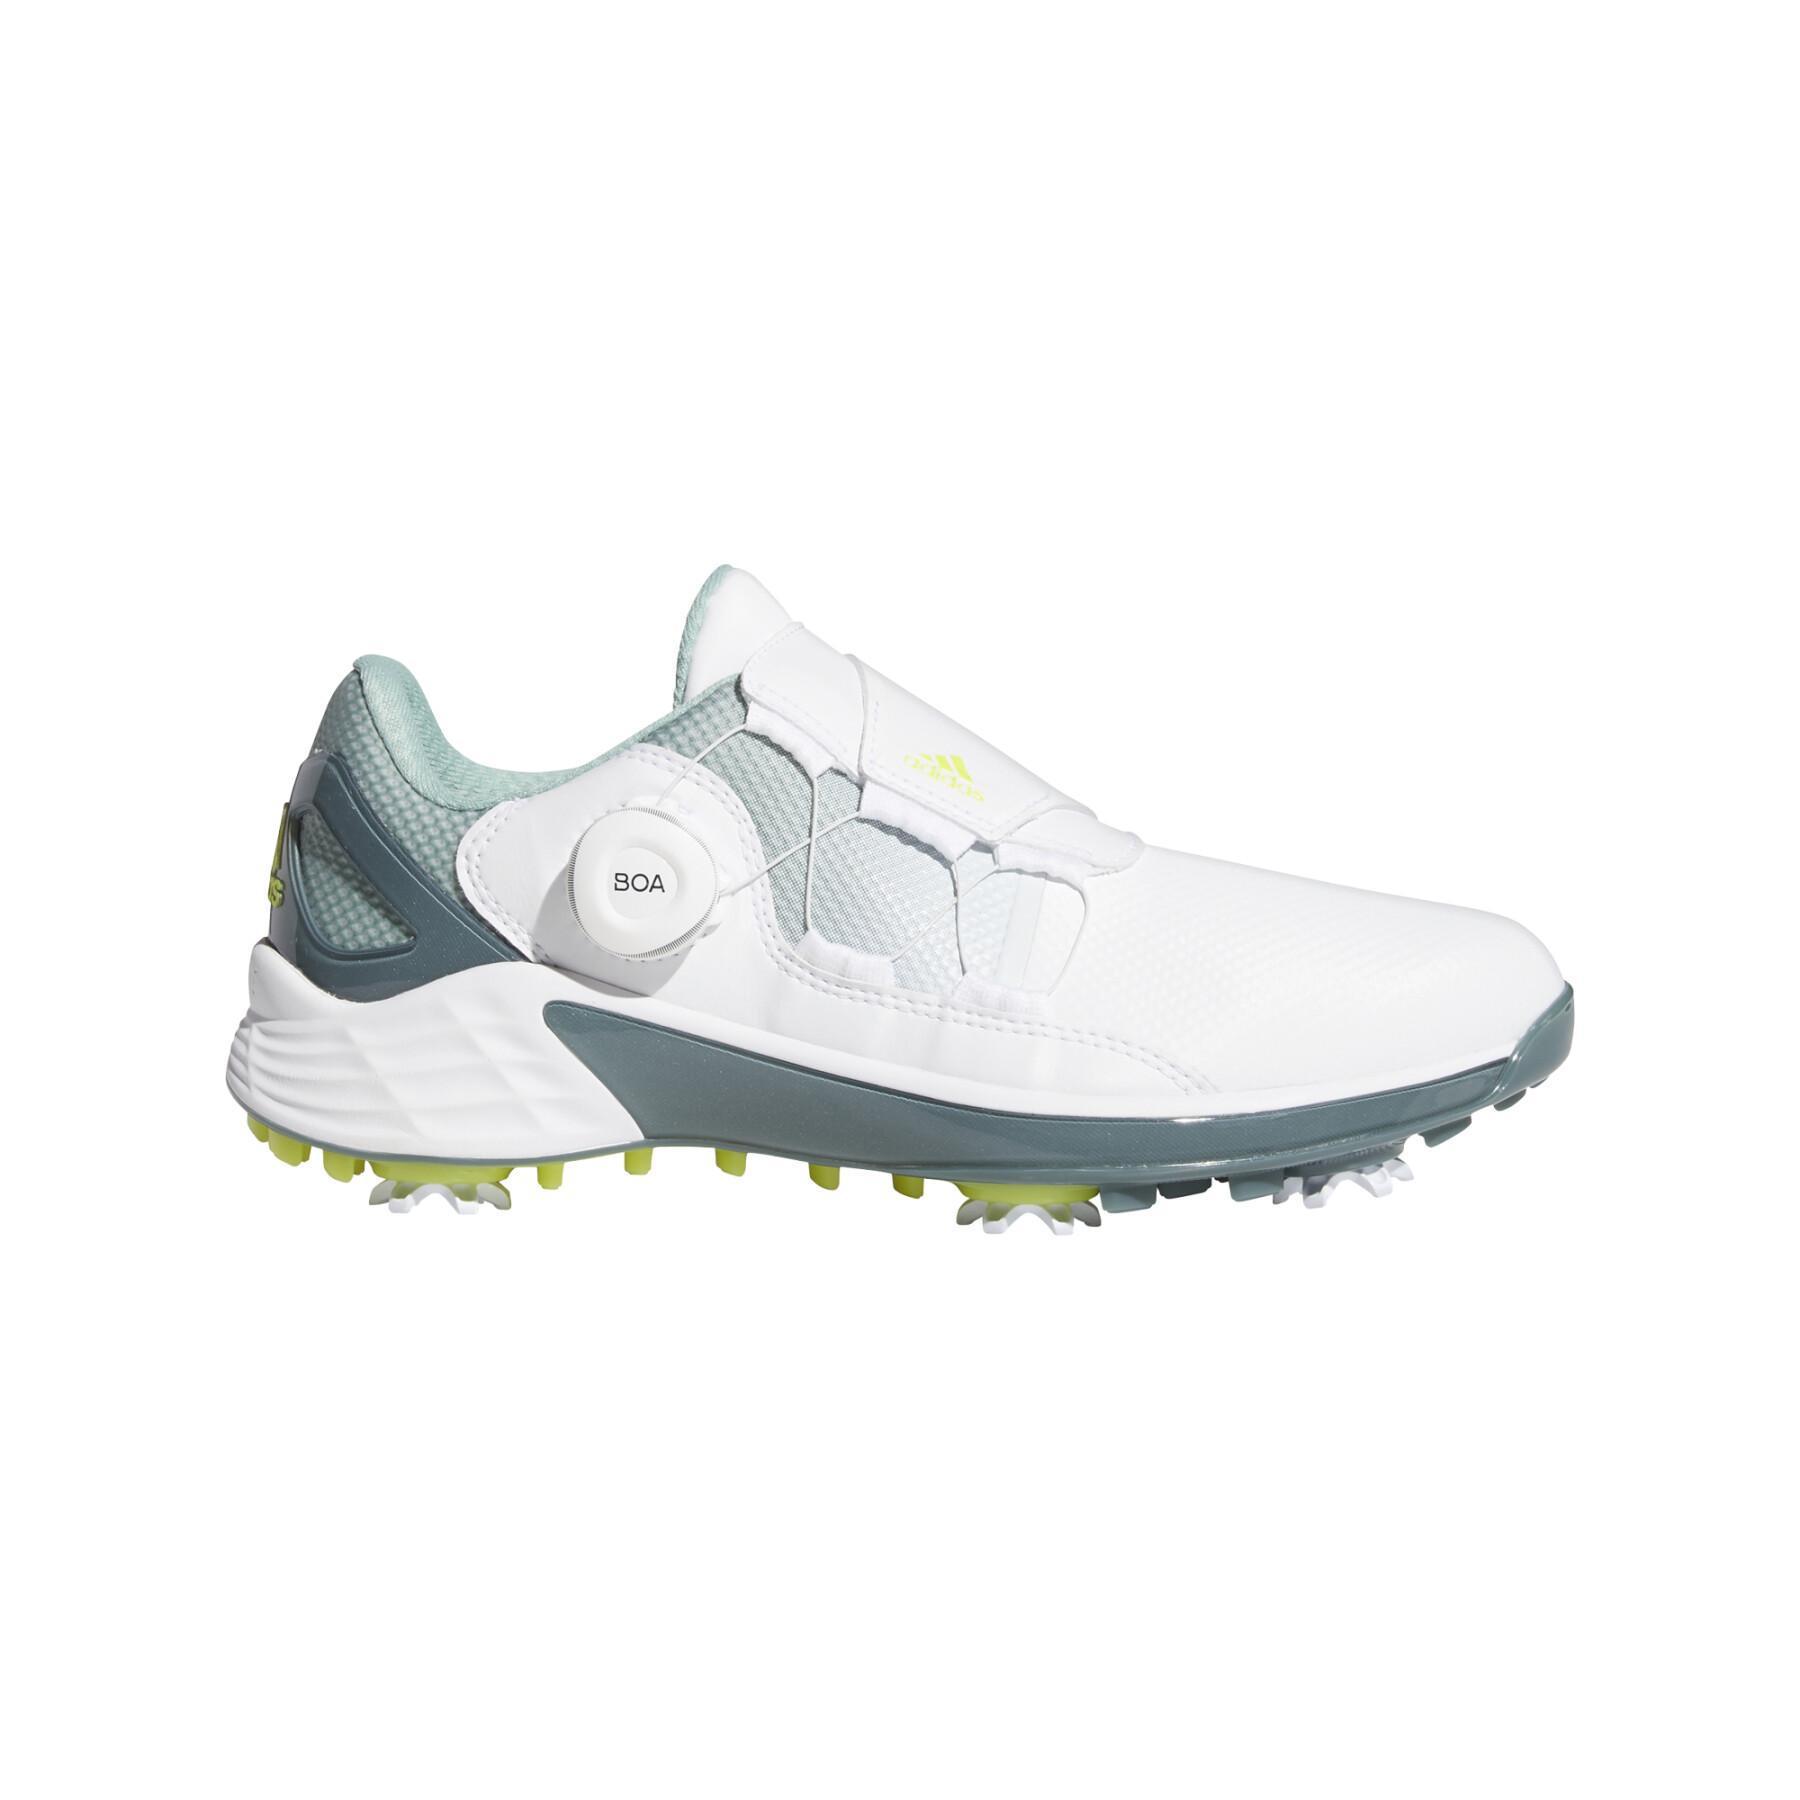 Schuhe für Frauen adidas ZG21 BOA